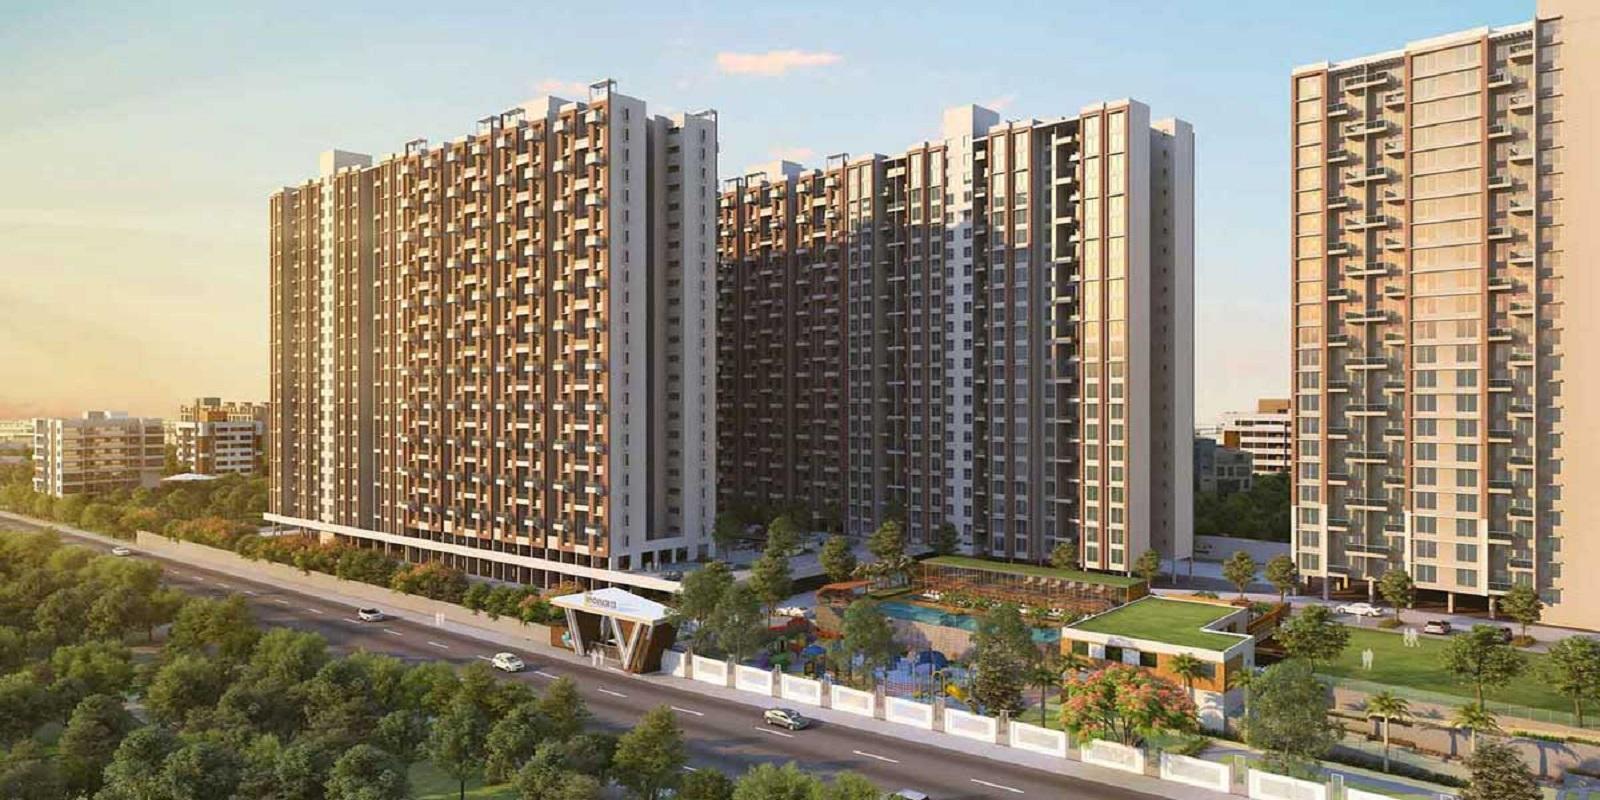 vtp leonara building c and f project large image2